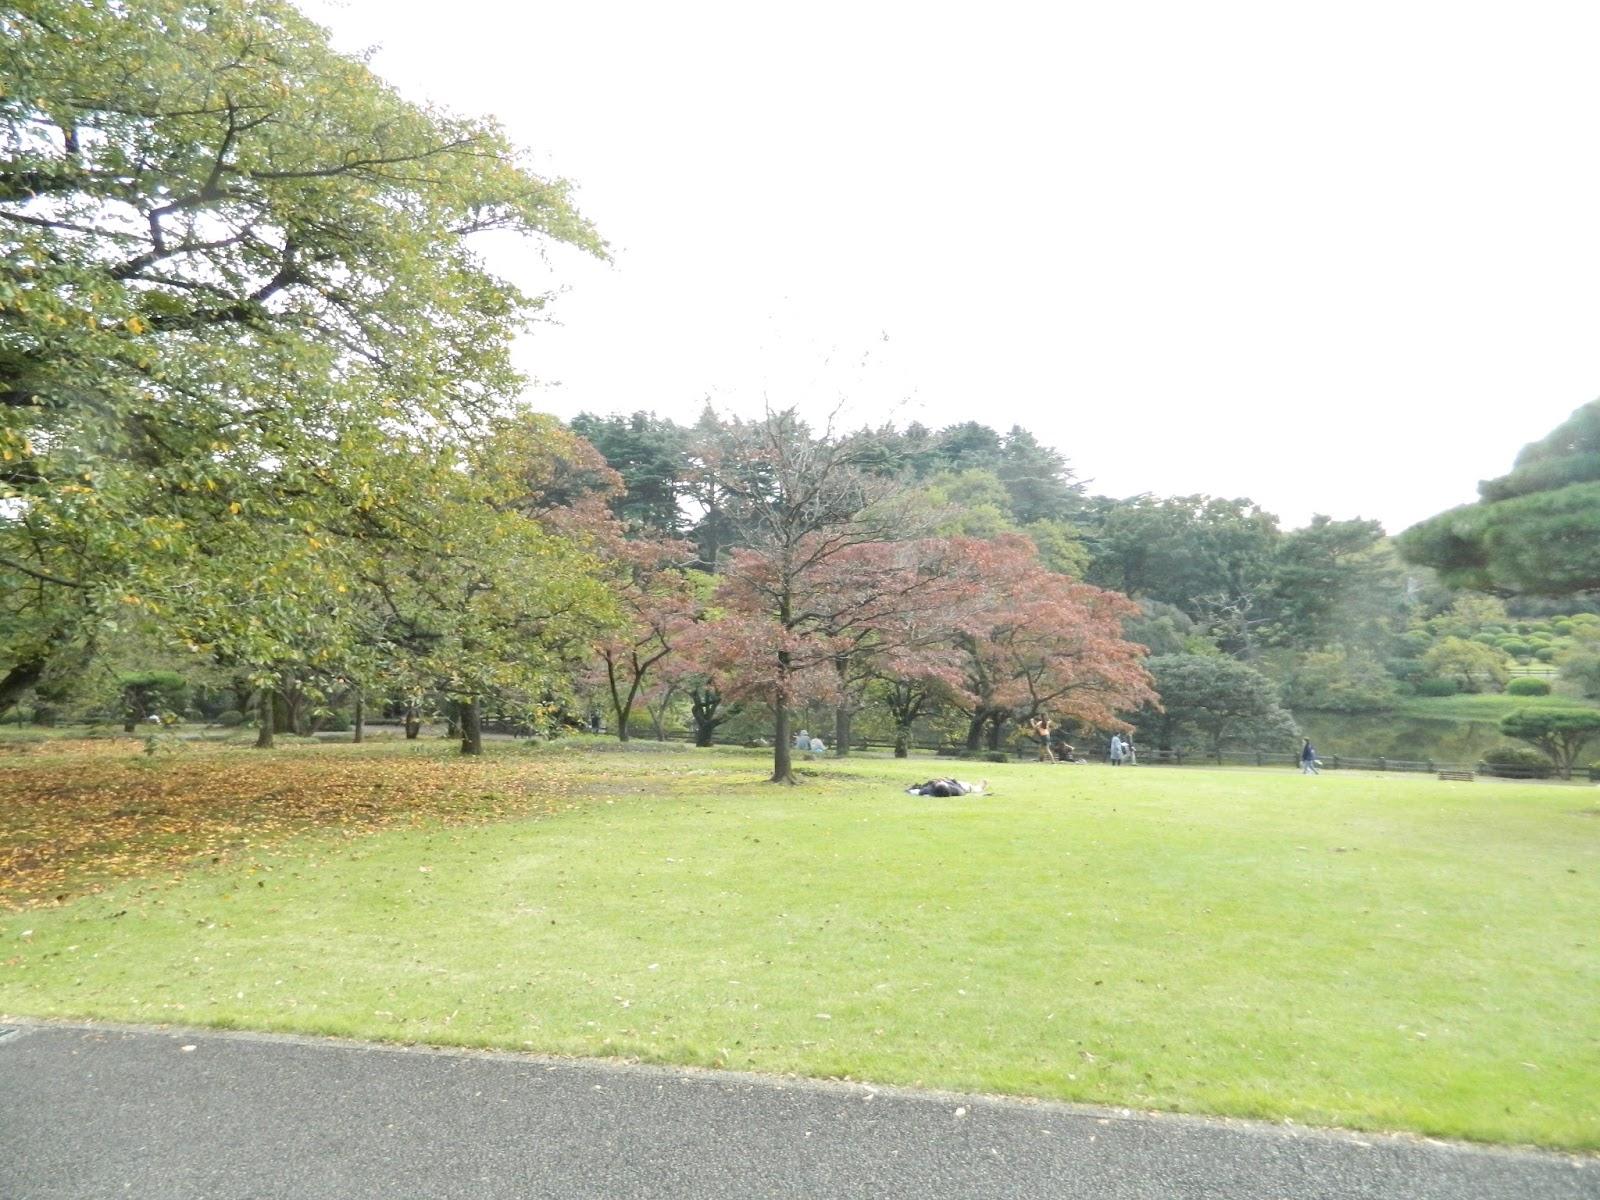 nihon fan: shinjuku gyoen - japanese traditional garden